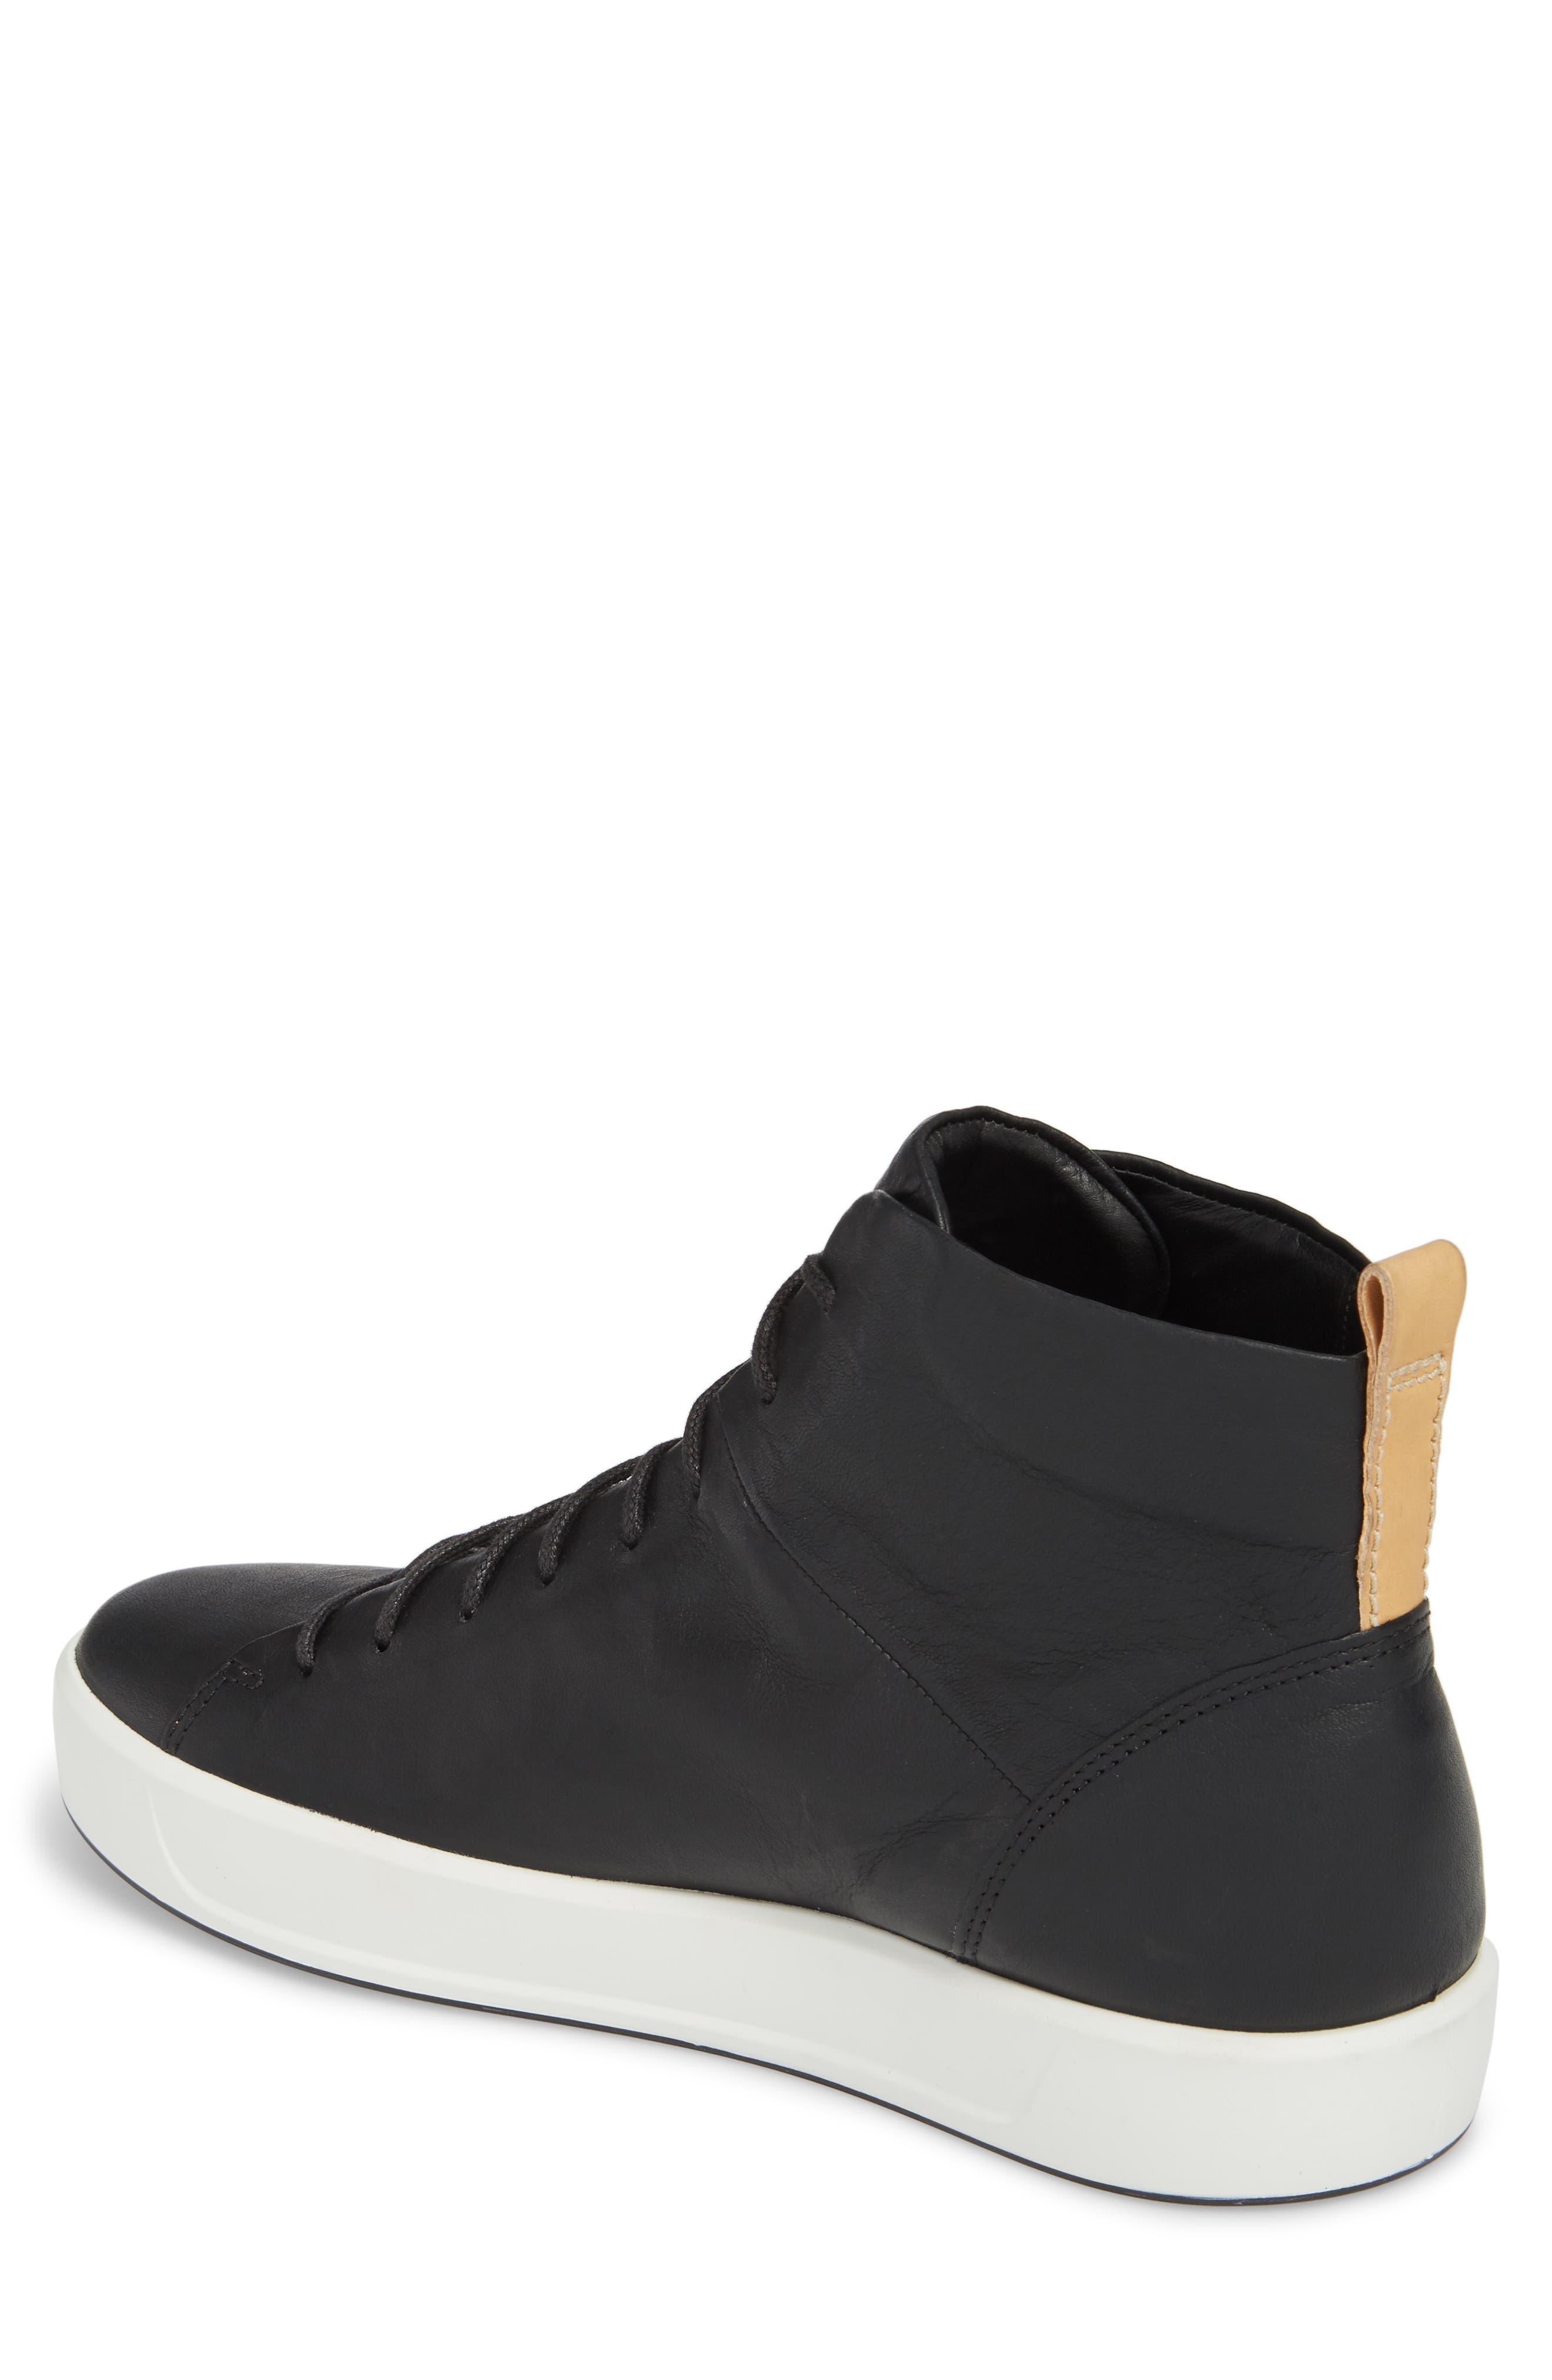 Soft 8 Sneaker,                             Alternate thumbnail 2, color,                             Black/Black Leather